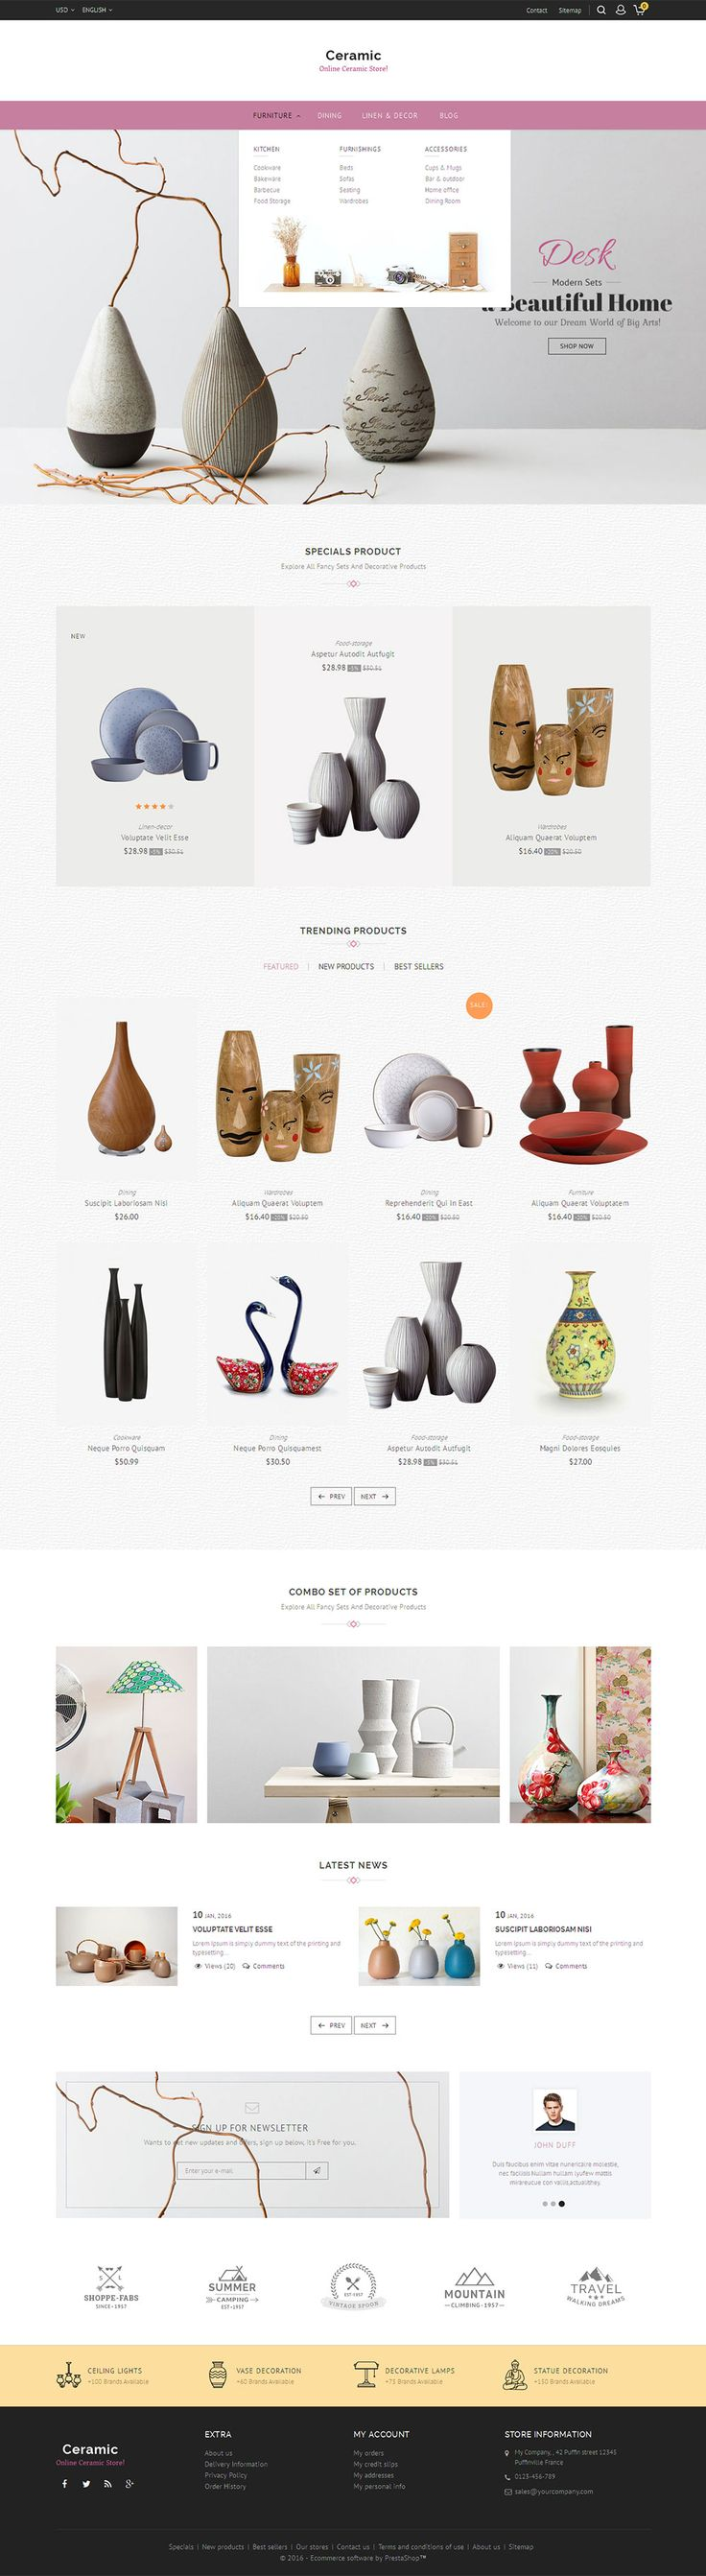 eCommerce Web Design - Prestashop Responsive Theme, #Ceramic #Modern #Art #Home…